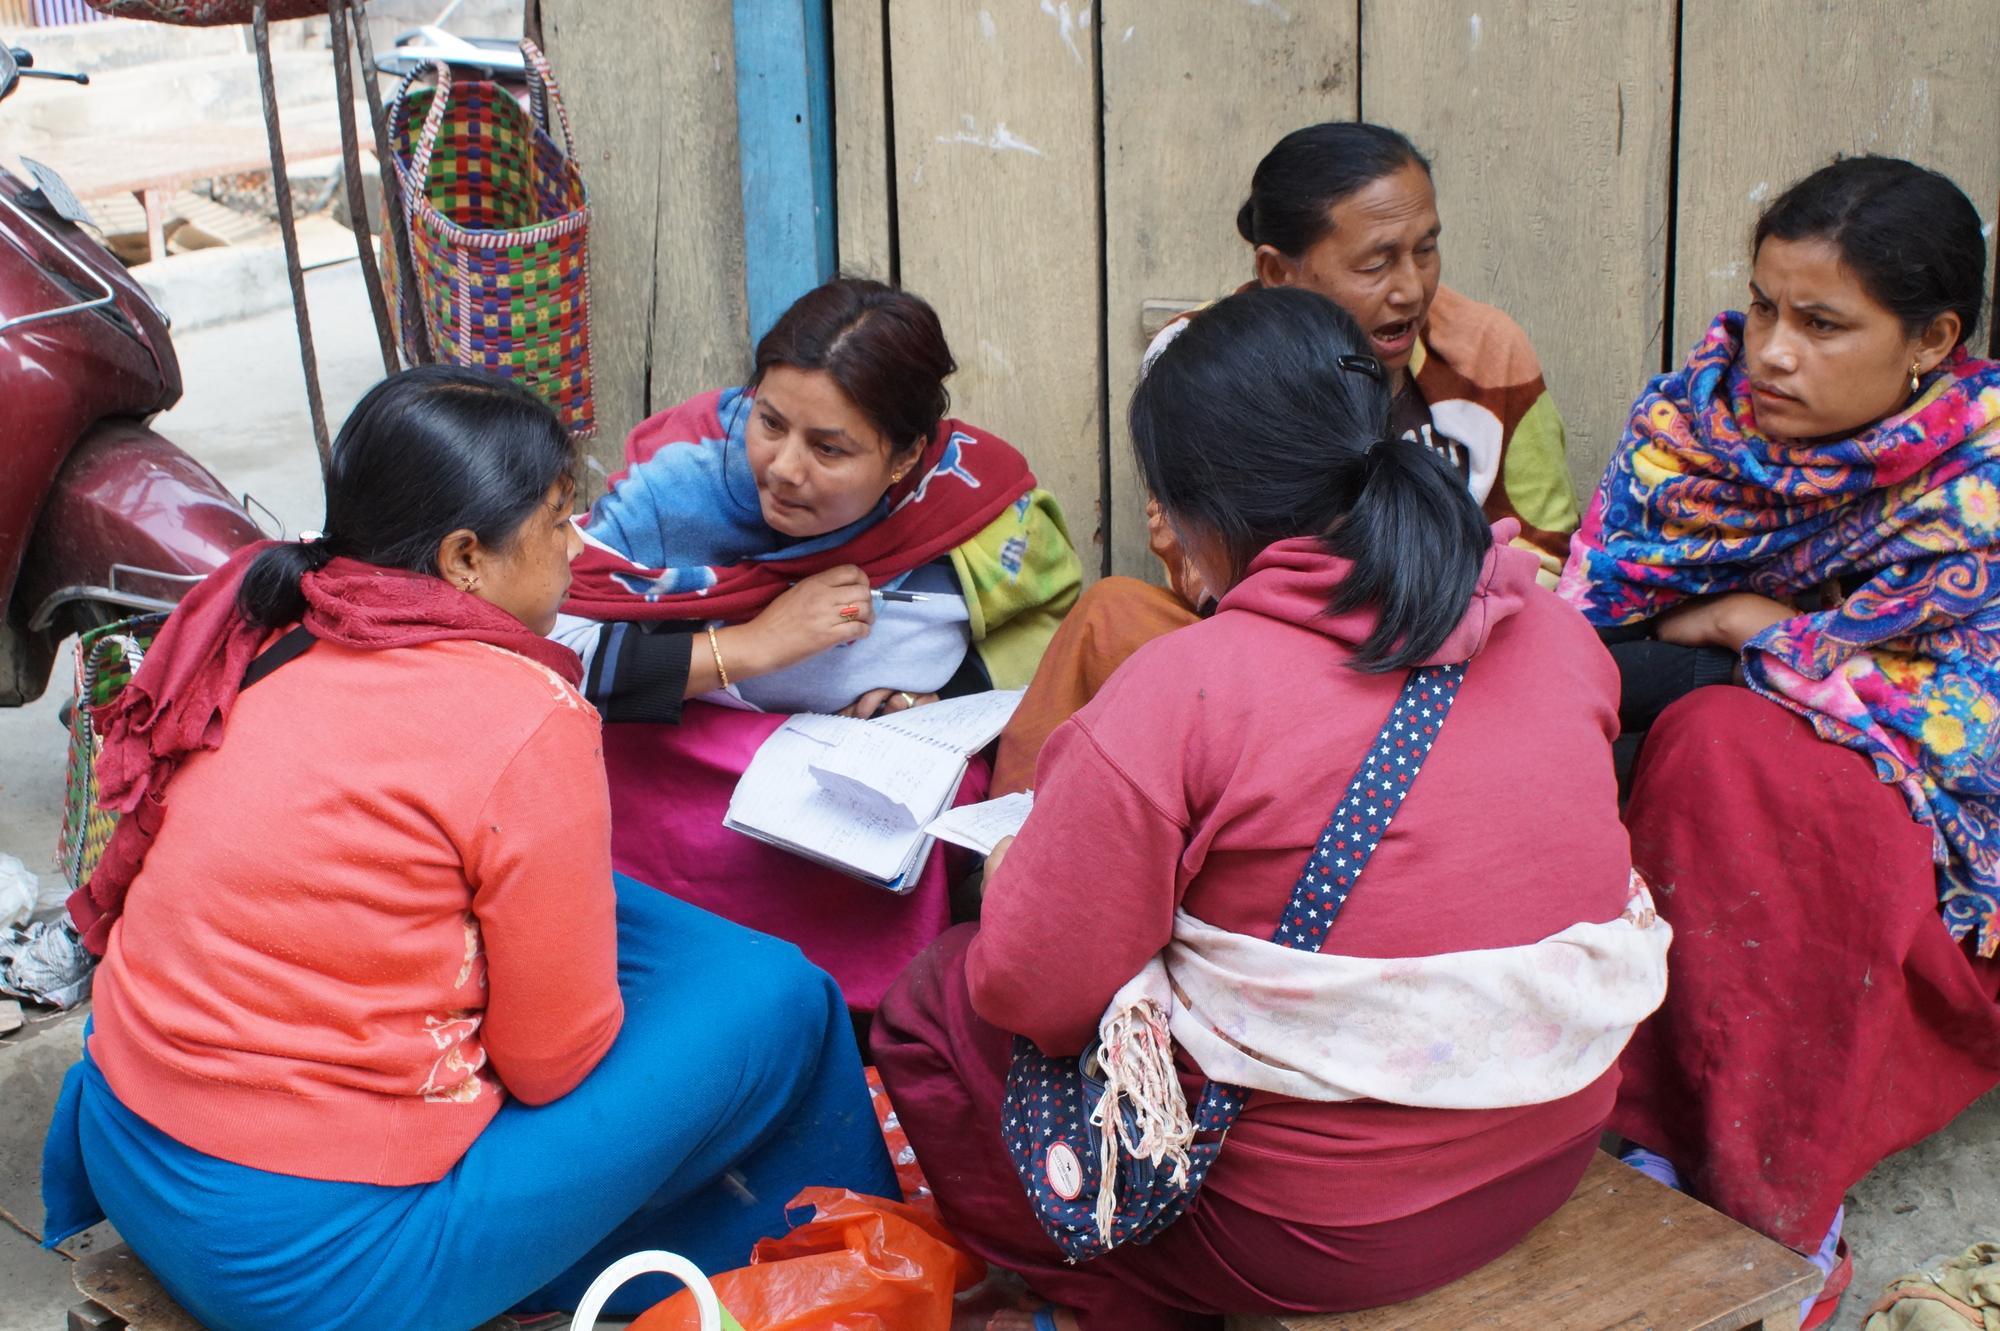 Image 4. Women debating. Source: Authors.